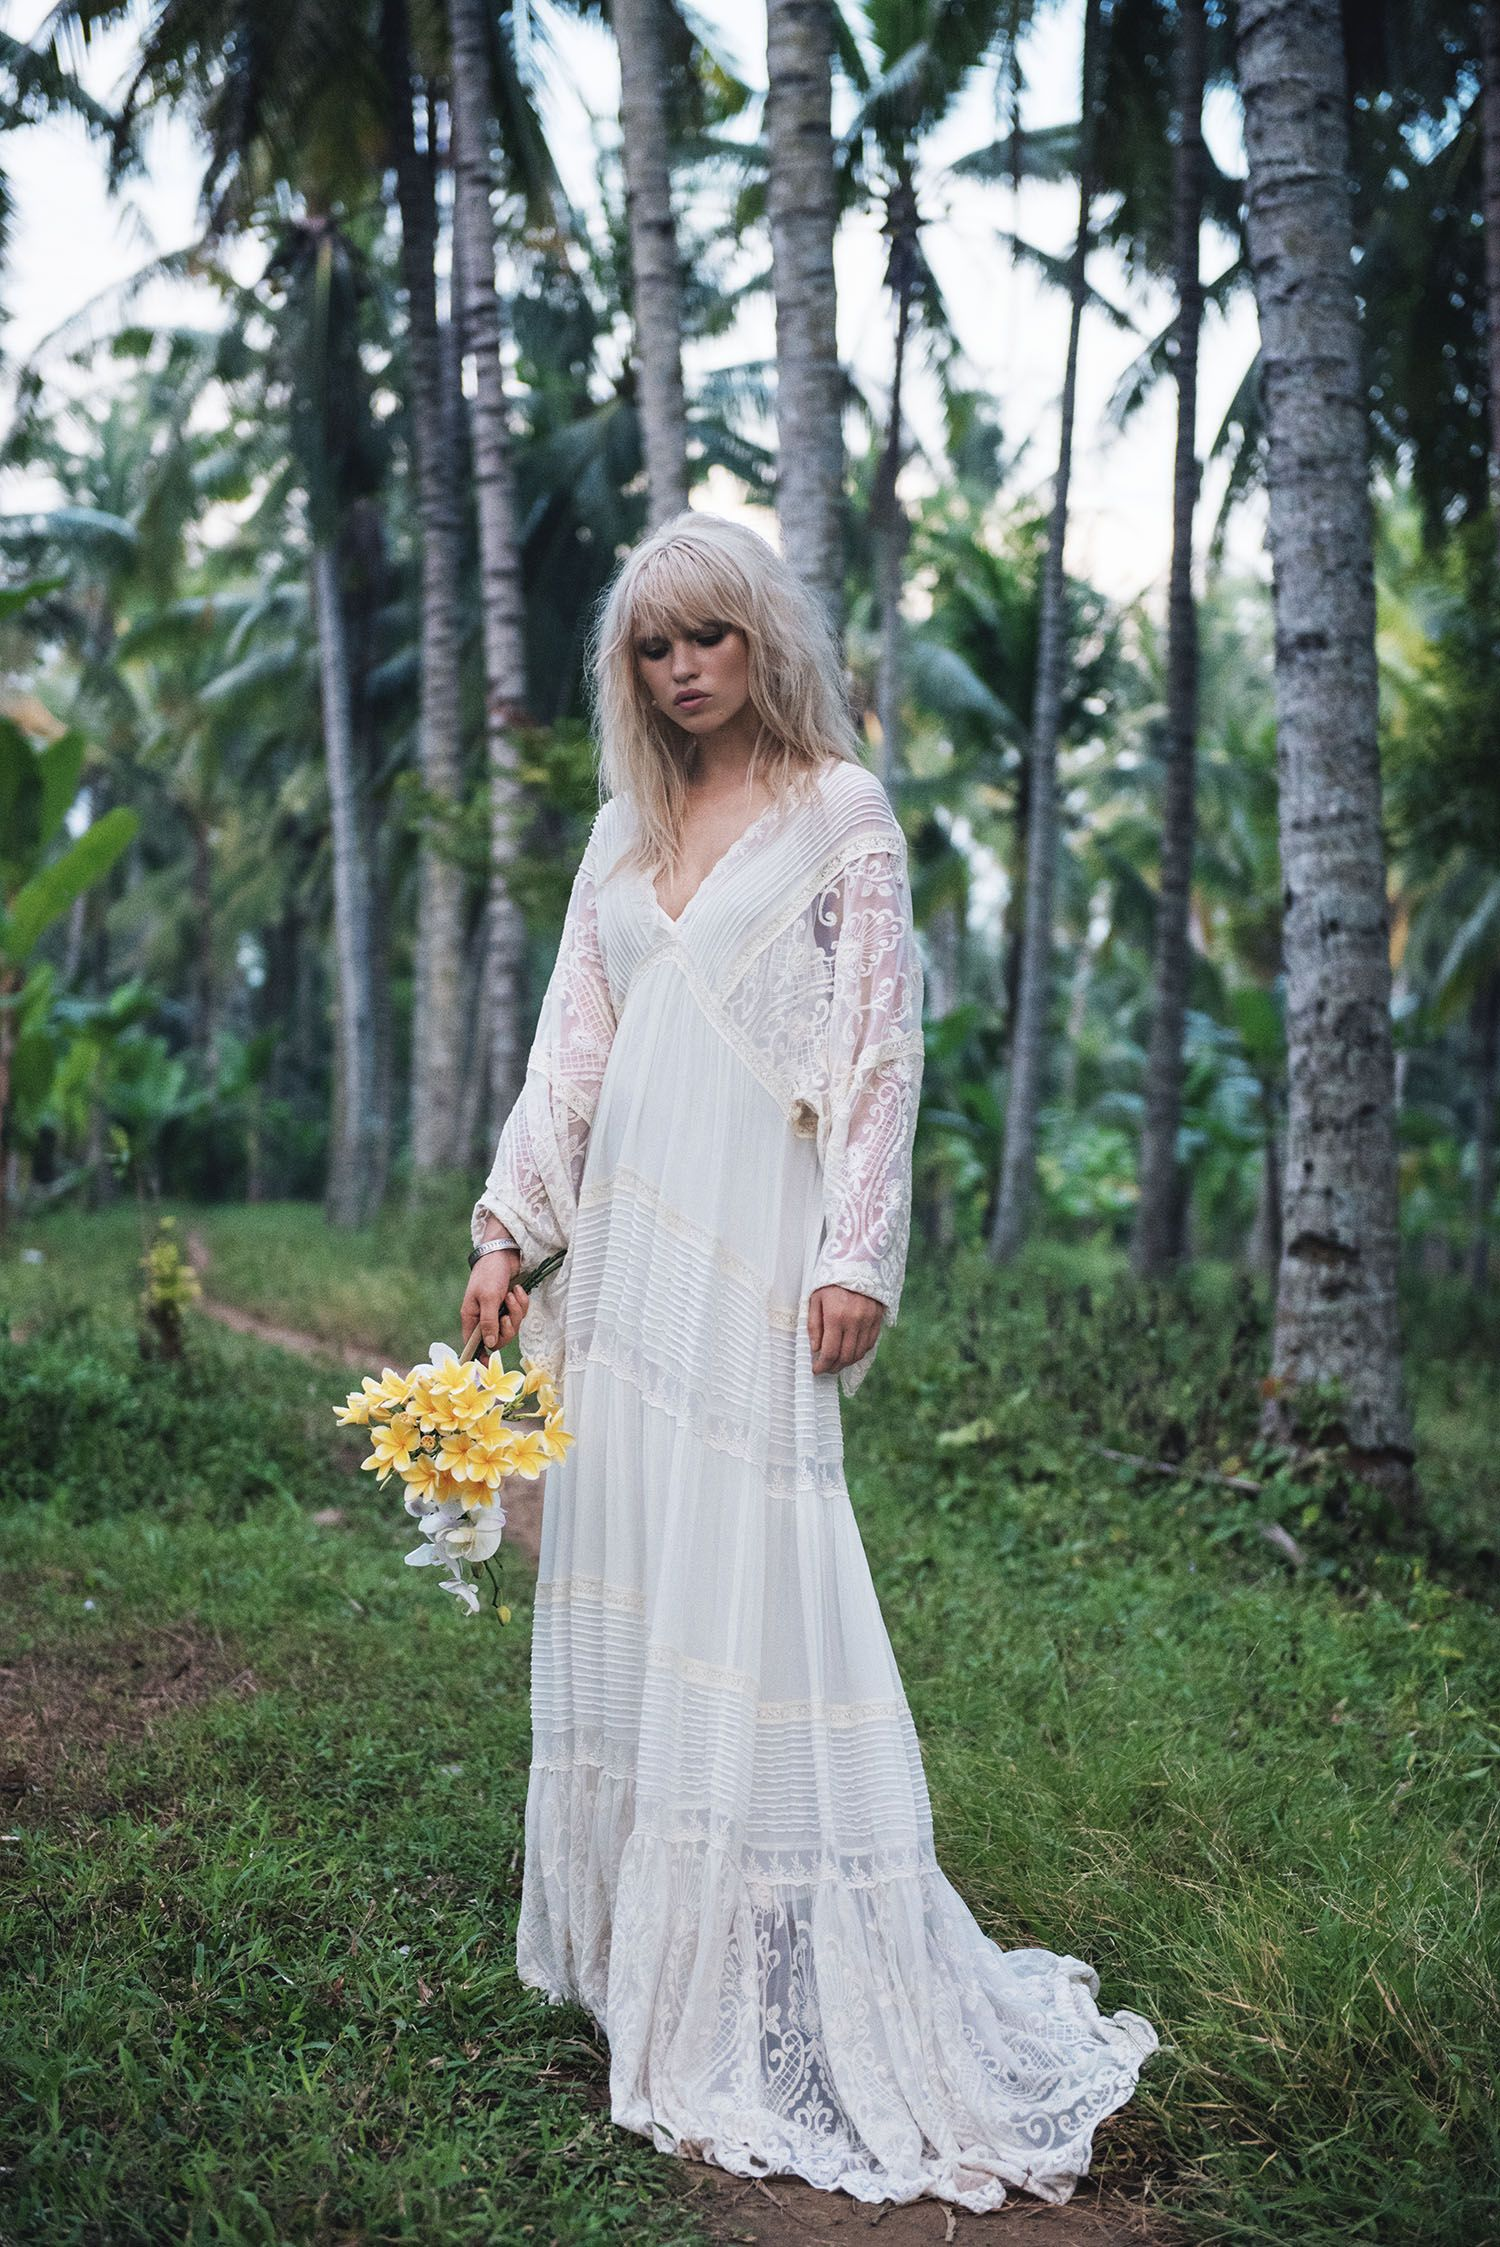 Spl 1696 Affordable Bohemian Wedding Dress Boho Wedding Dress Whimsical Wedding Gown